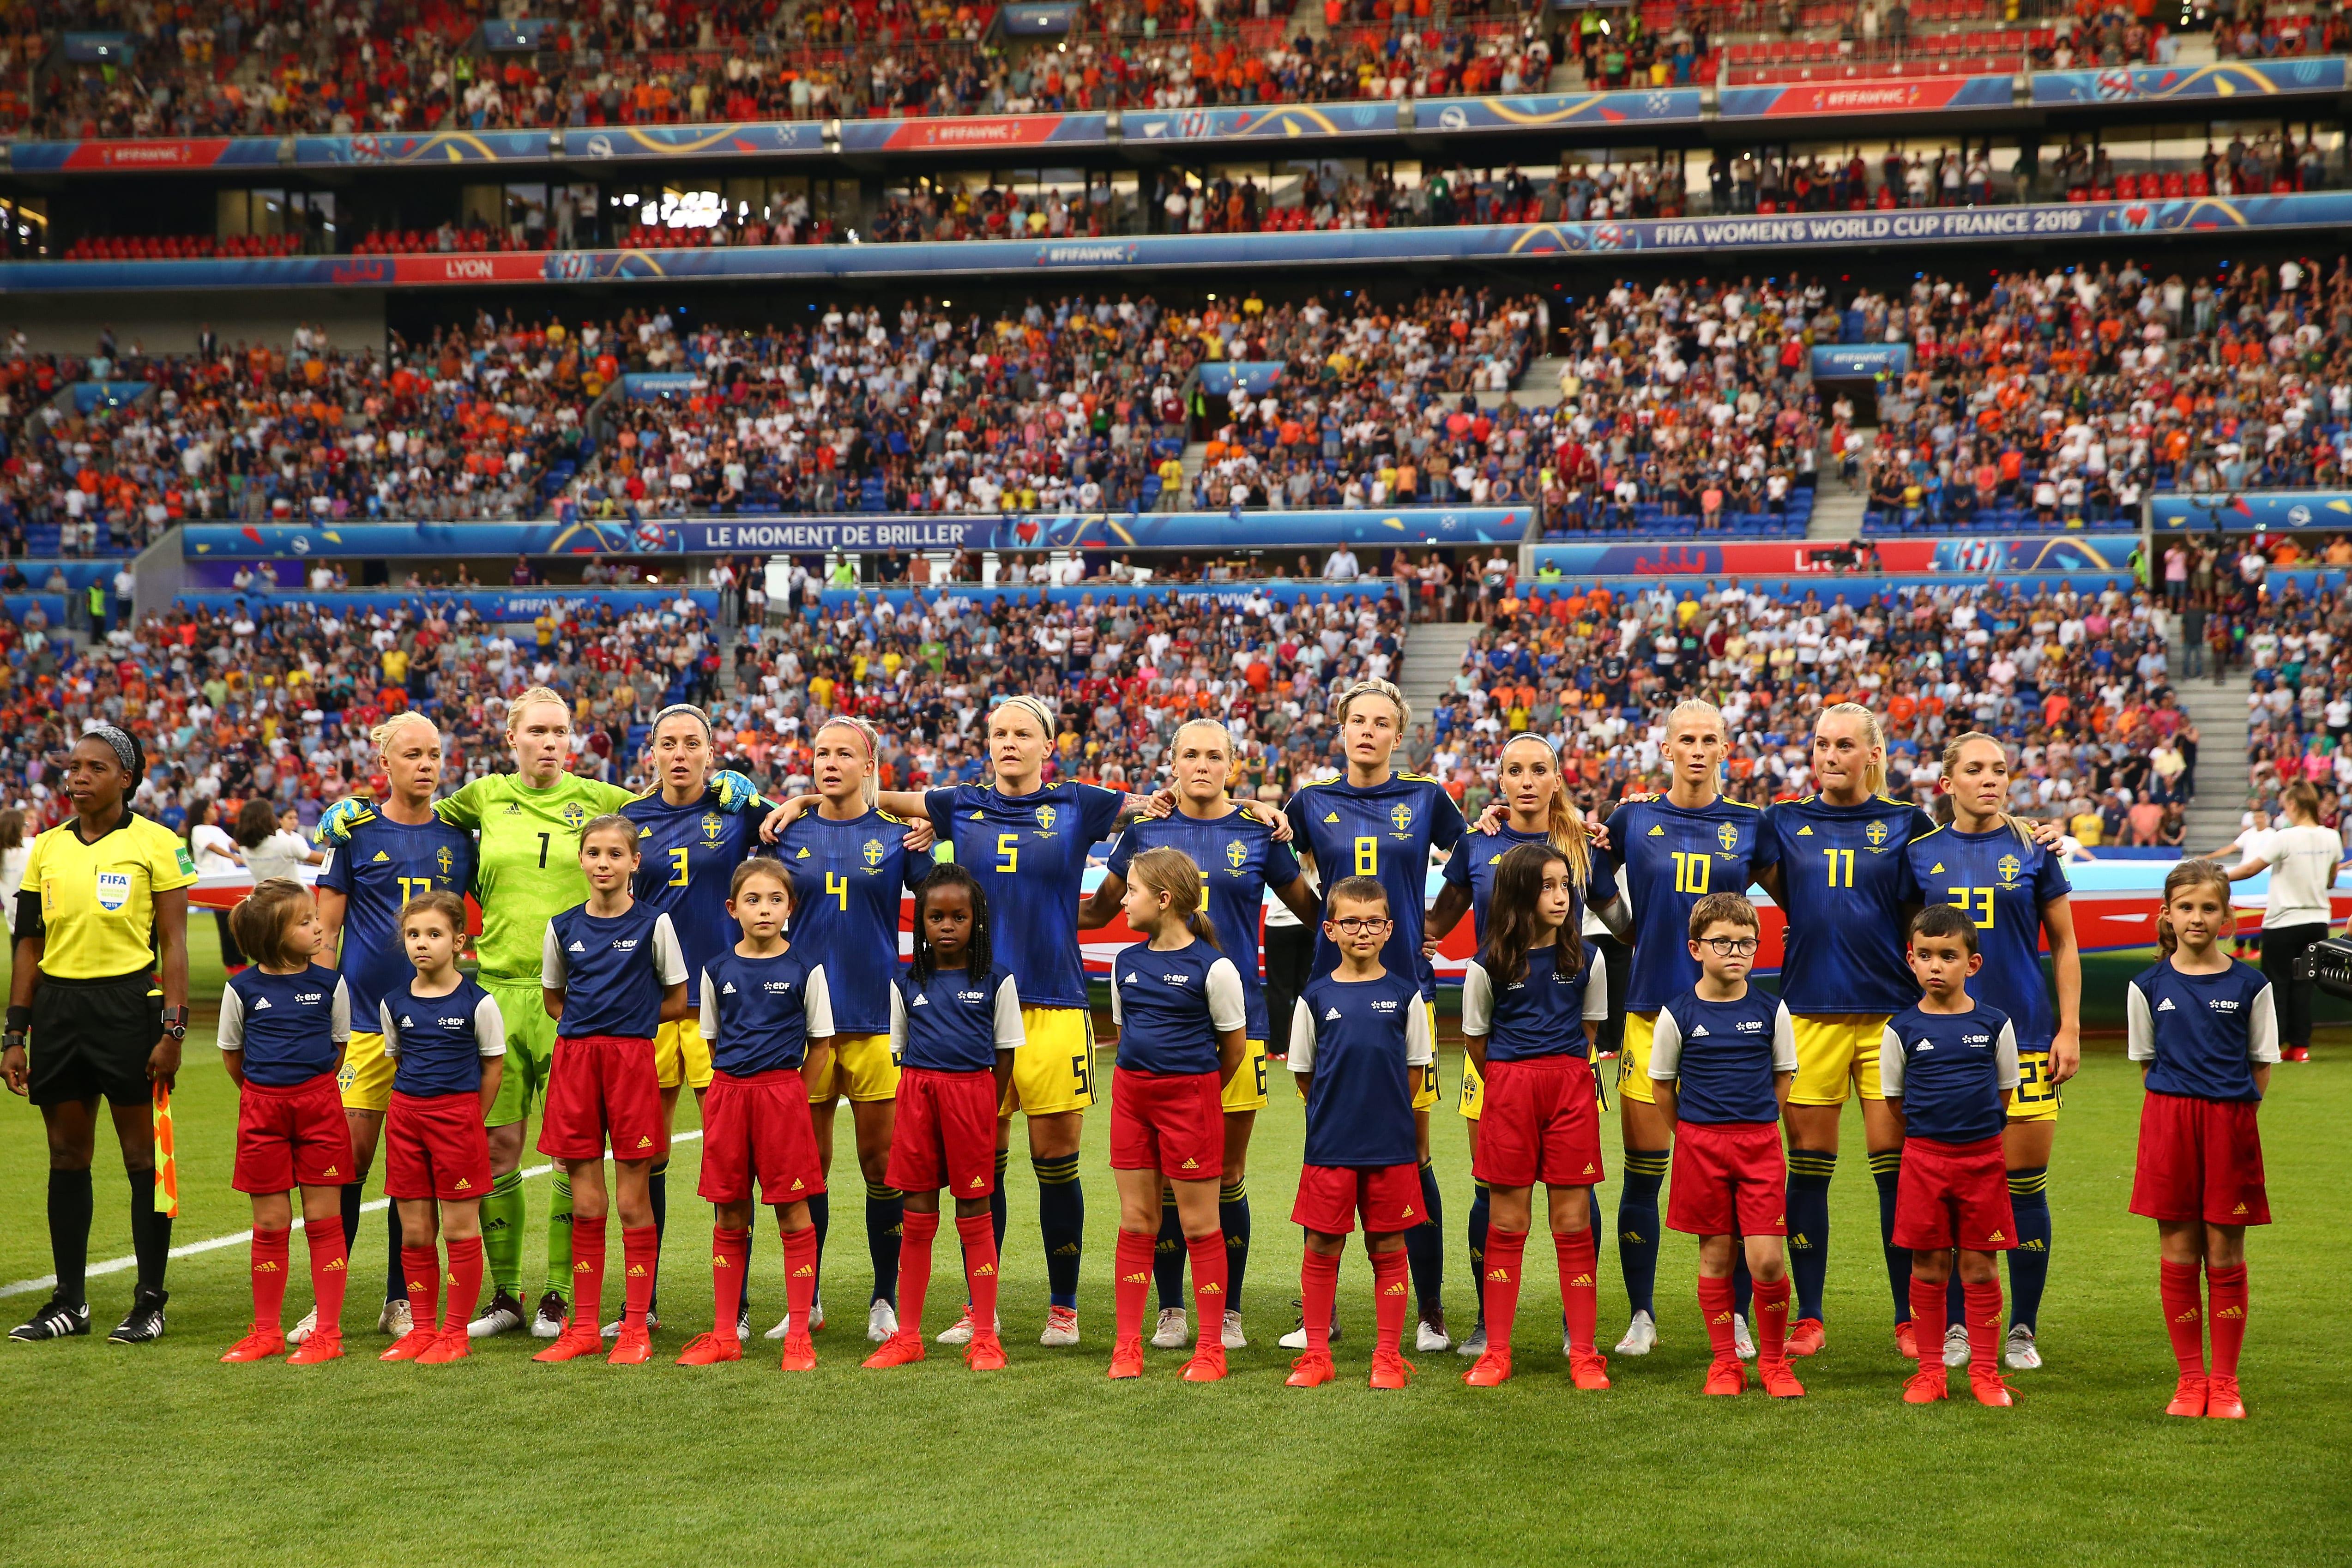 Suécia enfrenta a Inglaterra na disputa pelo terceiro lugar